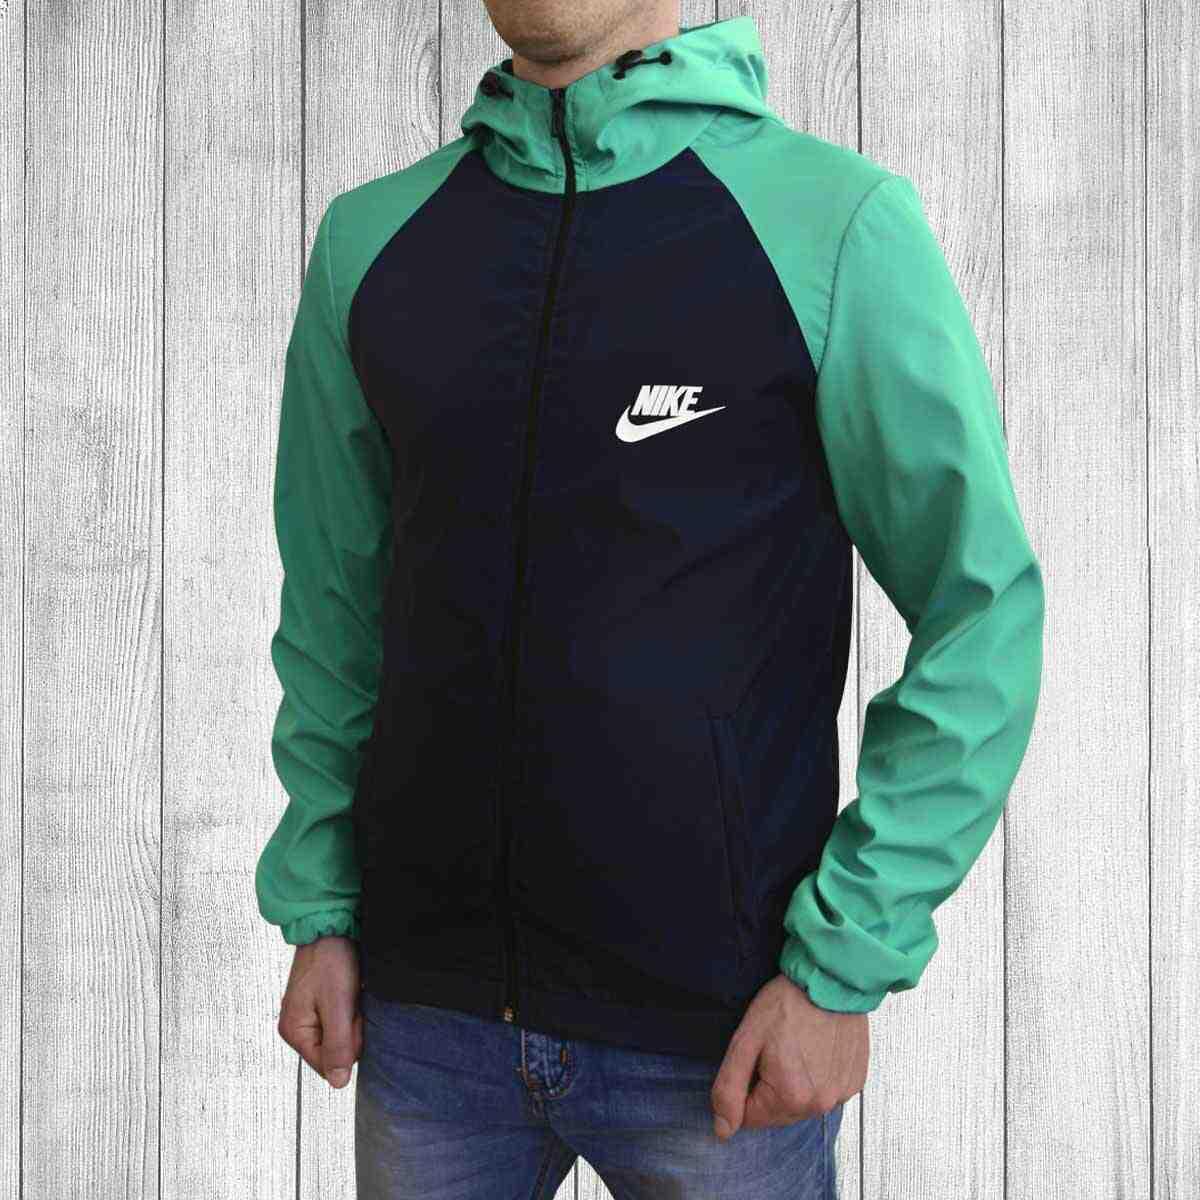 215b06a7 Спортивная мужская ветровка Nike копия - Профприбор Украина в Киеве